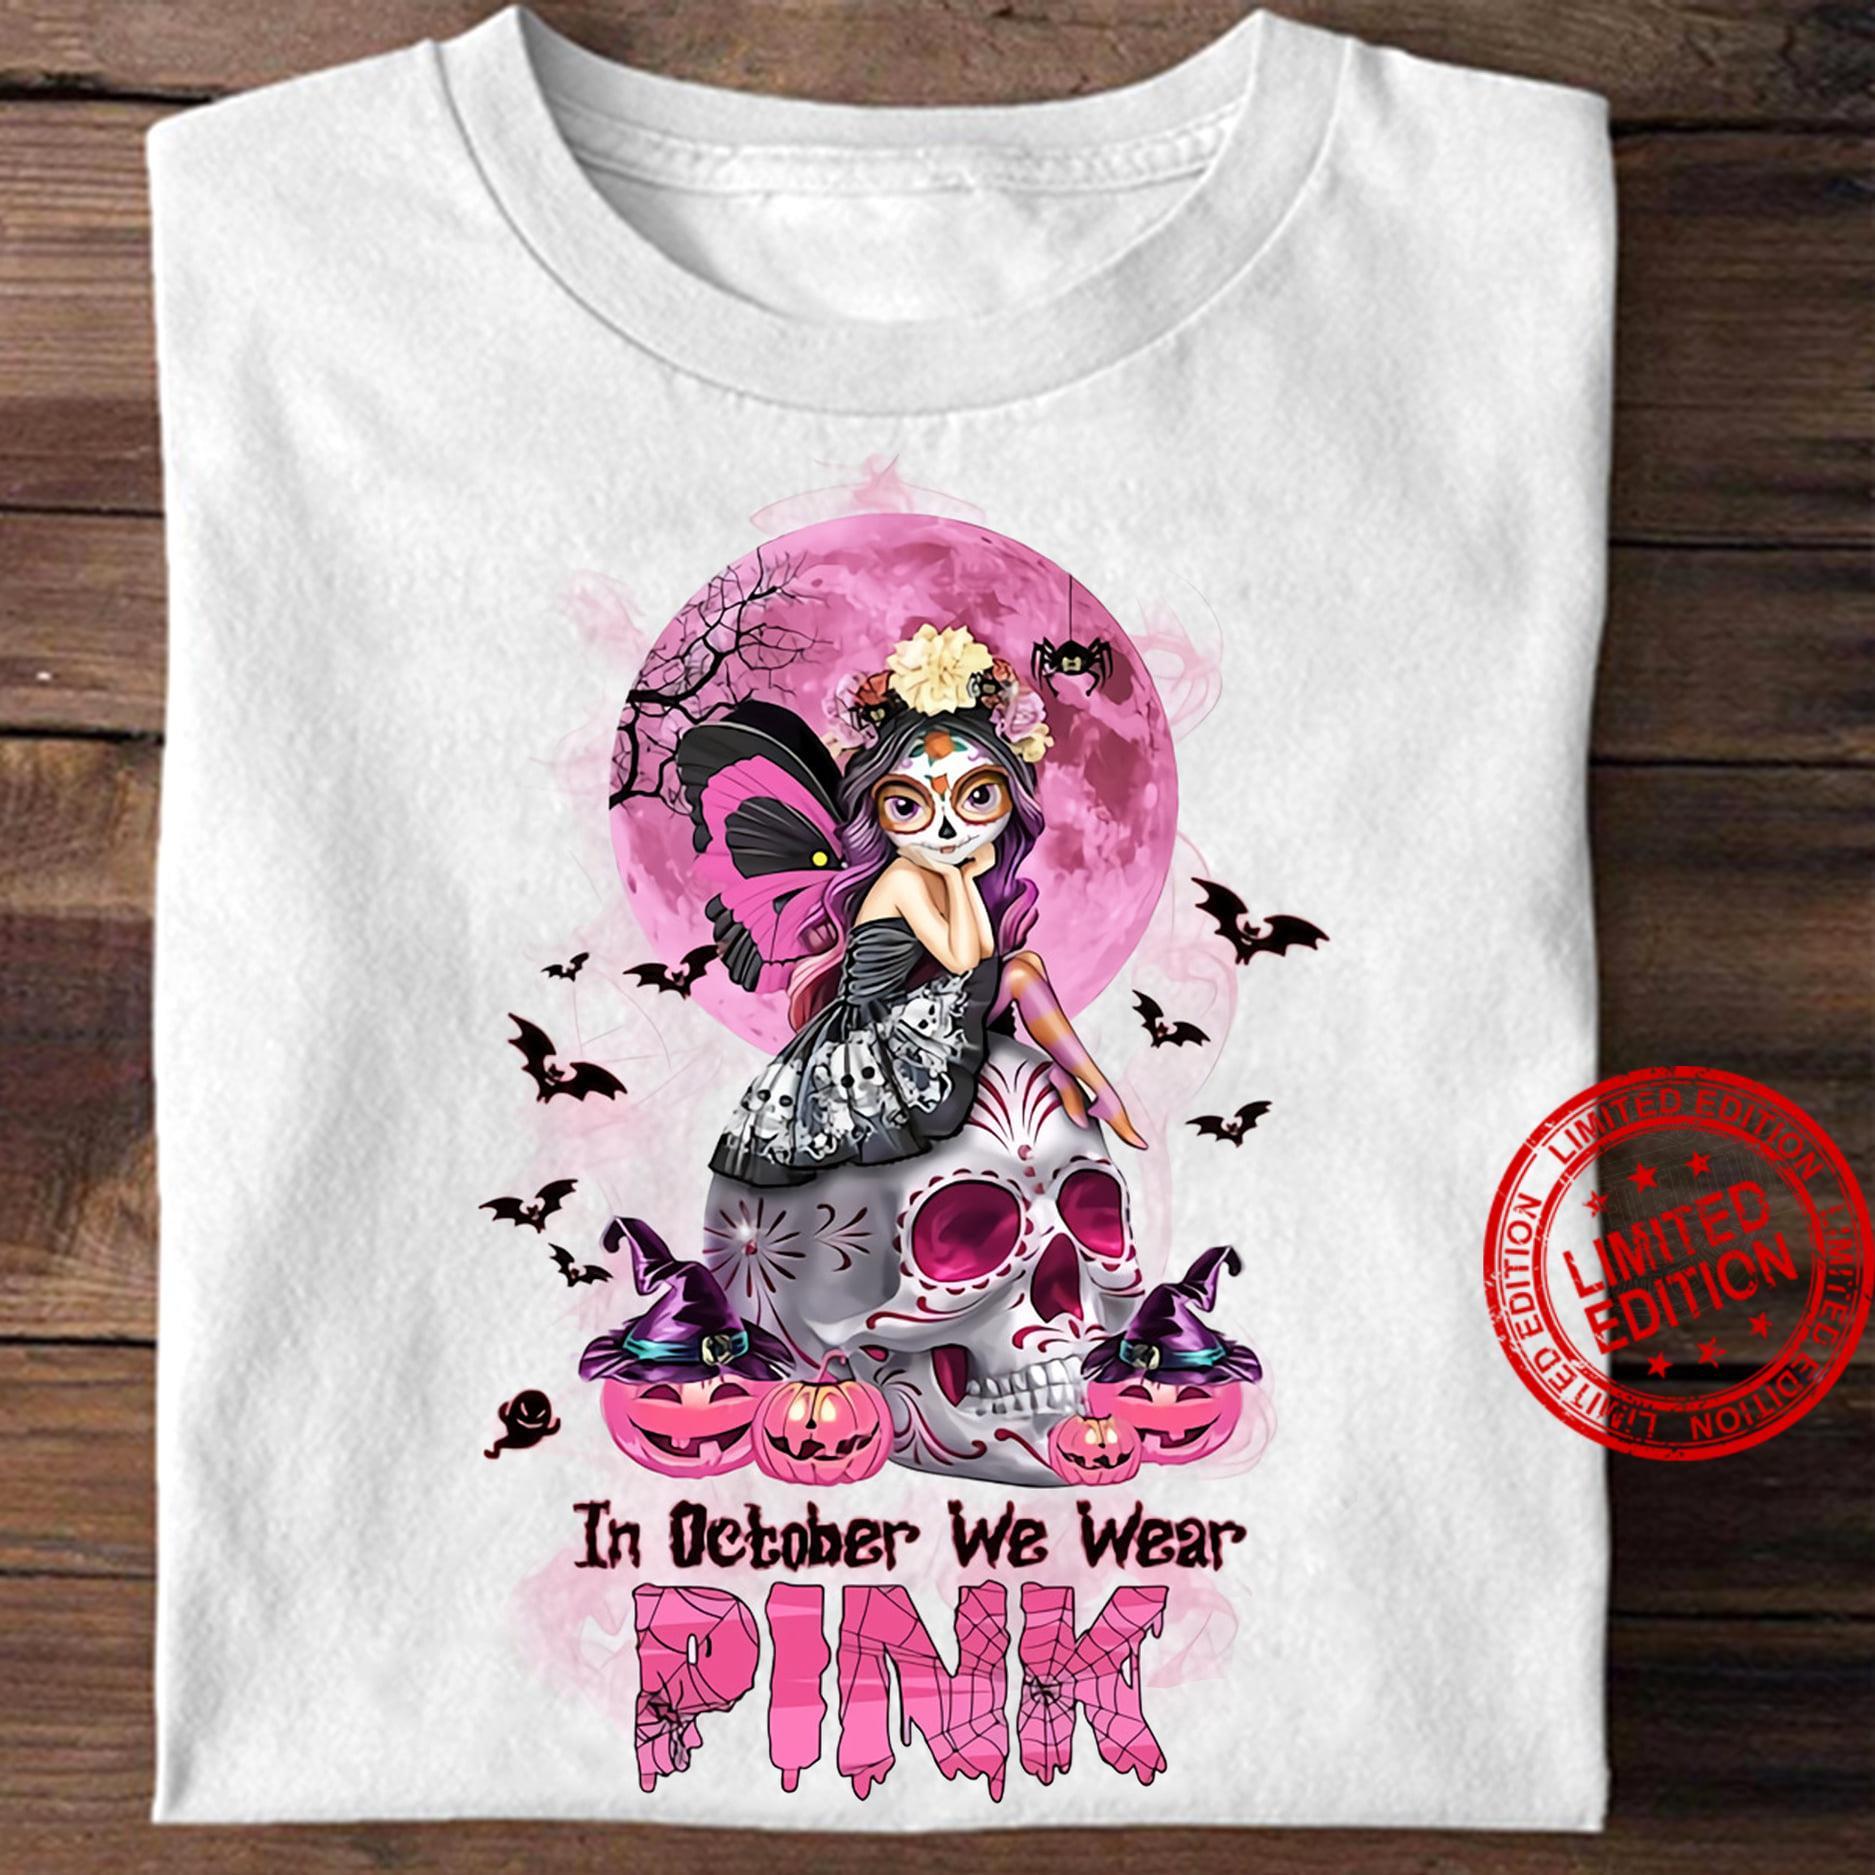 In October We Wear Pink Shirt